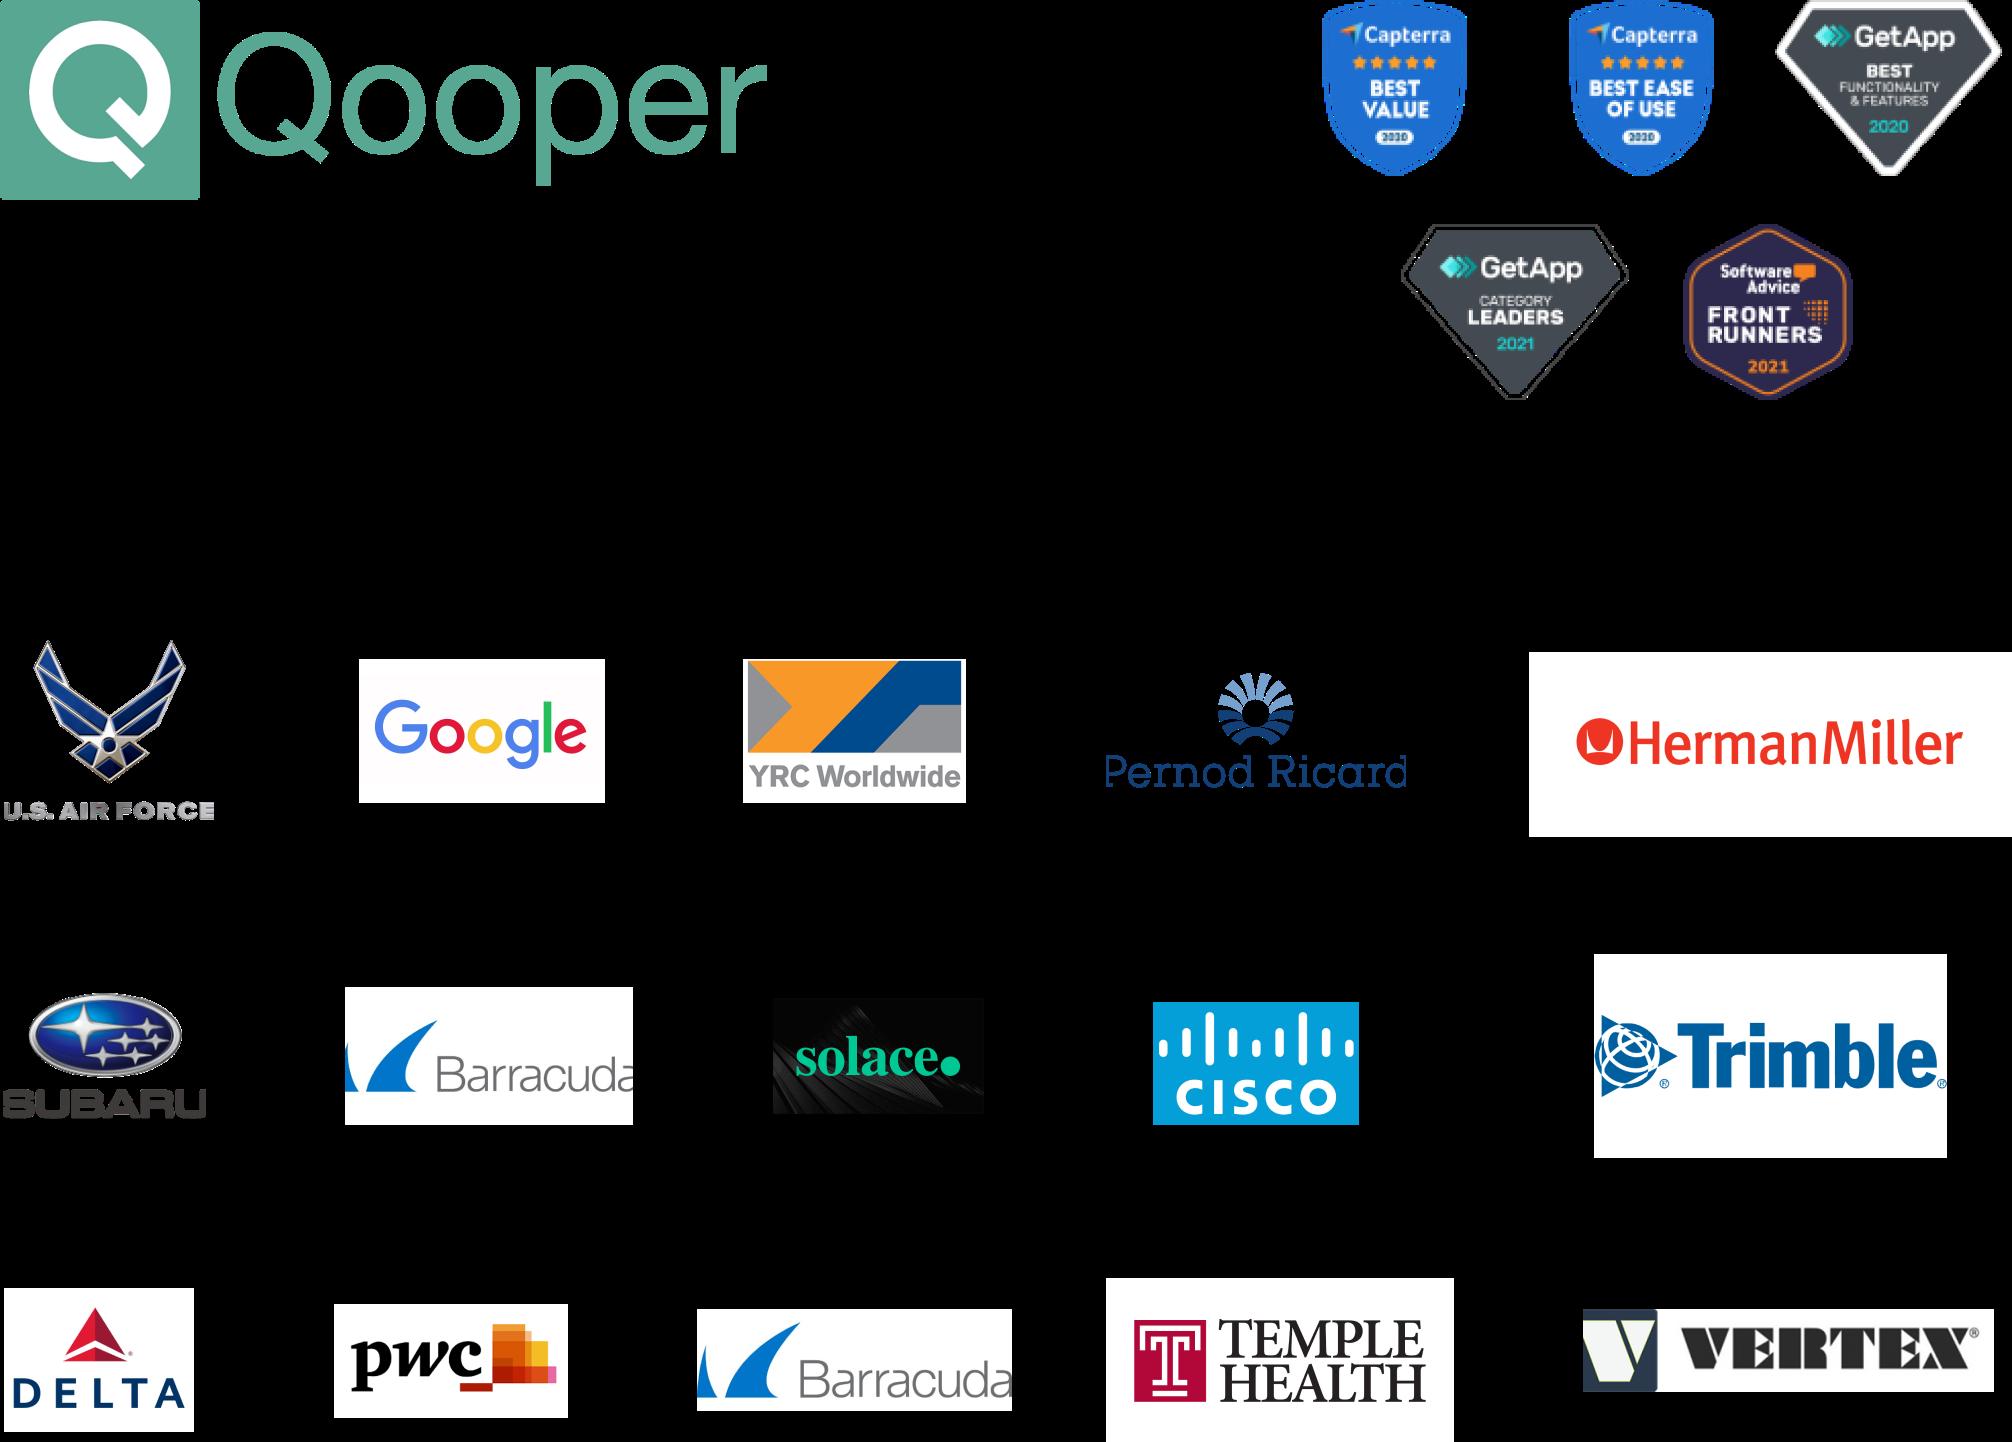 Qooper Customers & Awards